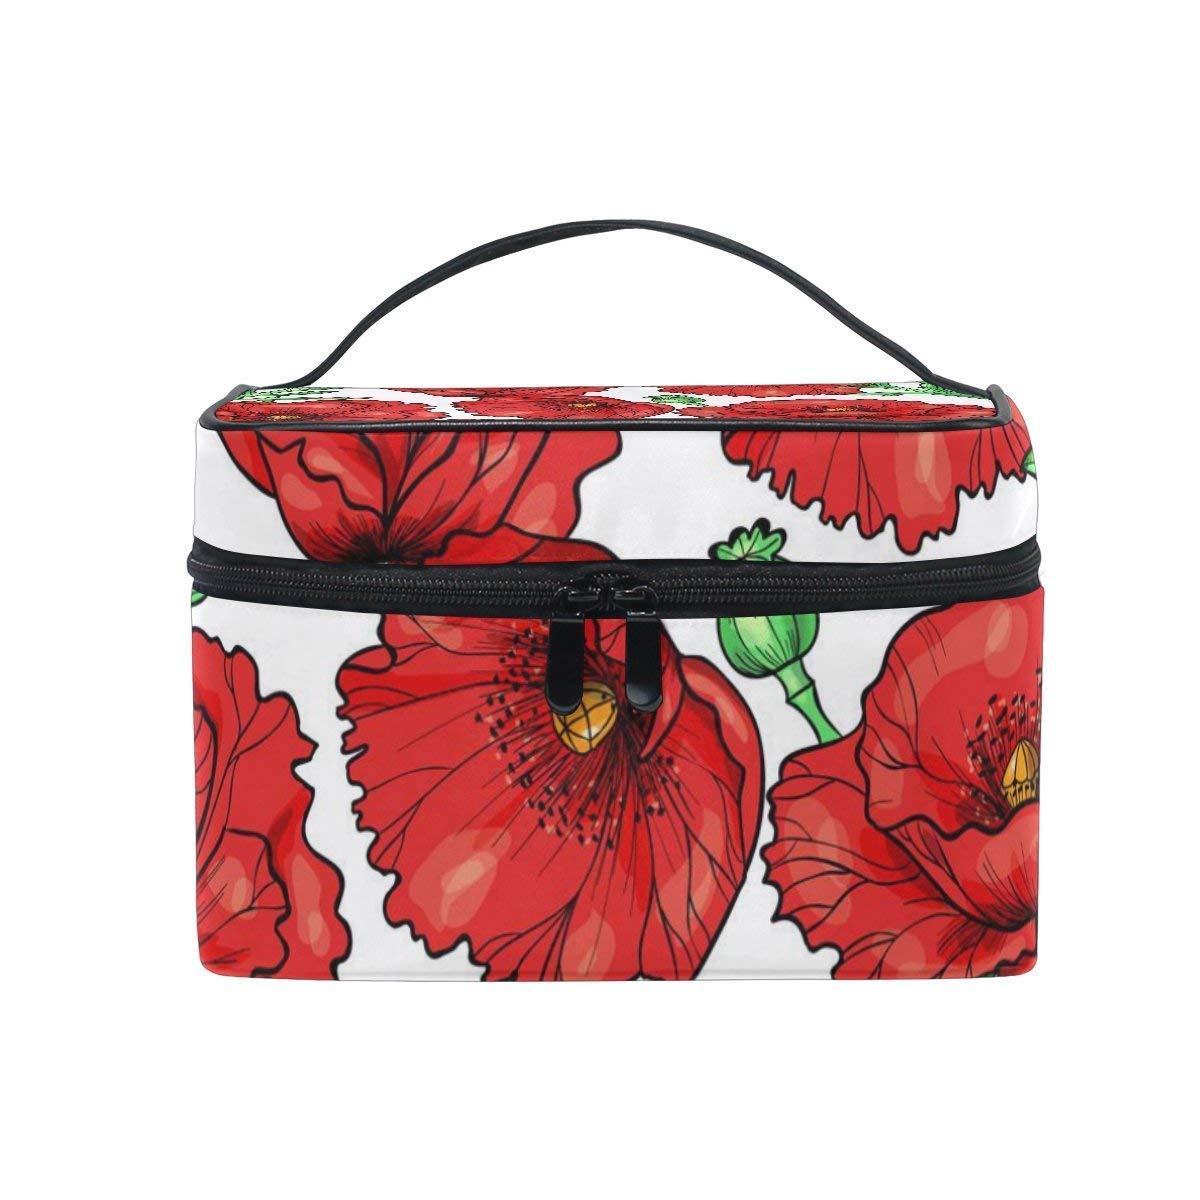 f82d63f6377e Amazon.com : Cosmetic Case Bag Poppy Flower Portable Travel Makeup ...